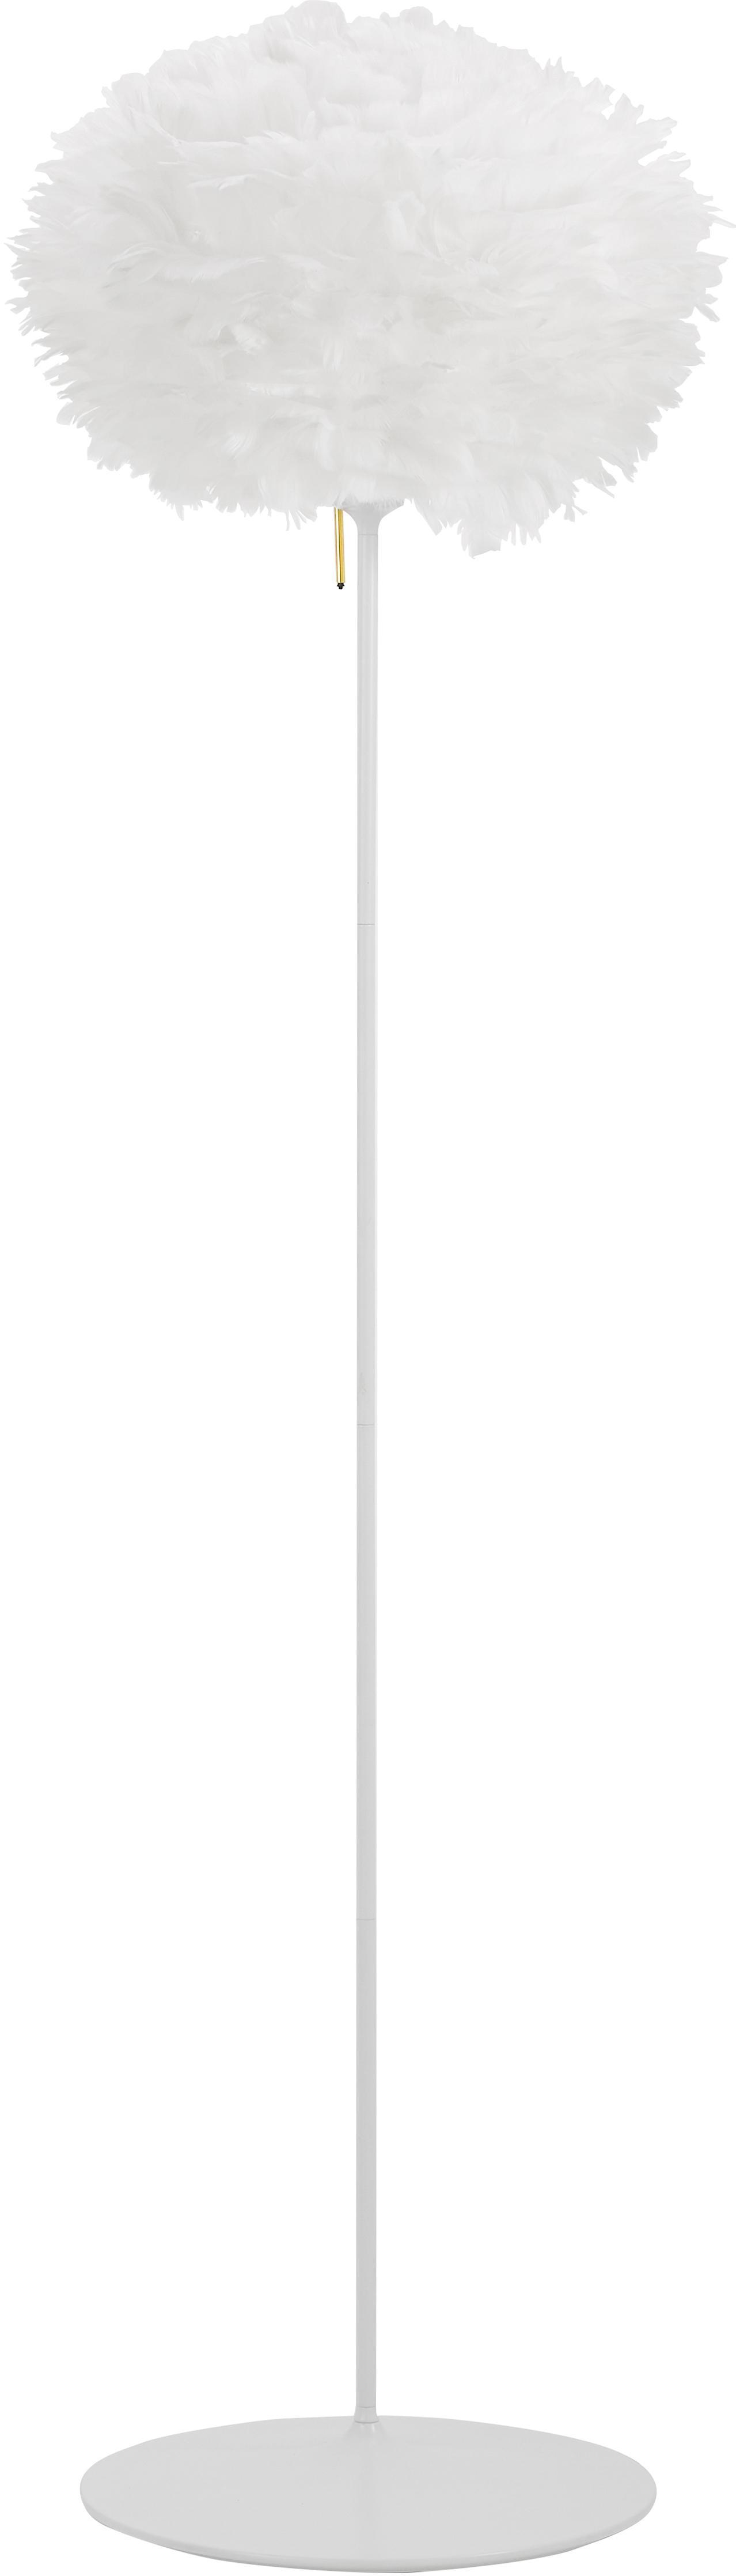 Stehlampe Eos aus Federn, Lampenschirm: Gänsefedern, Gestell: Aluminium, lackiert, Weiss, Ø 45 x H 170 cm